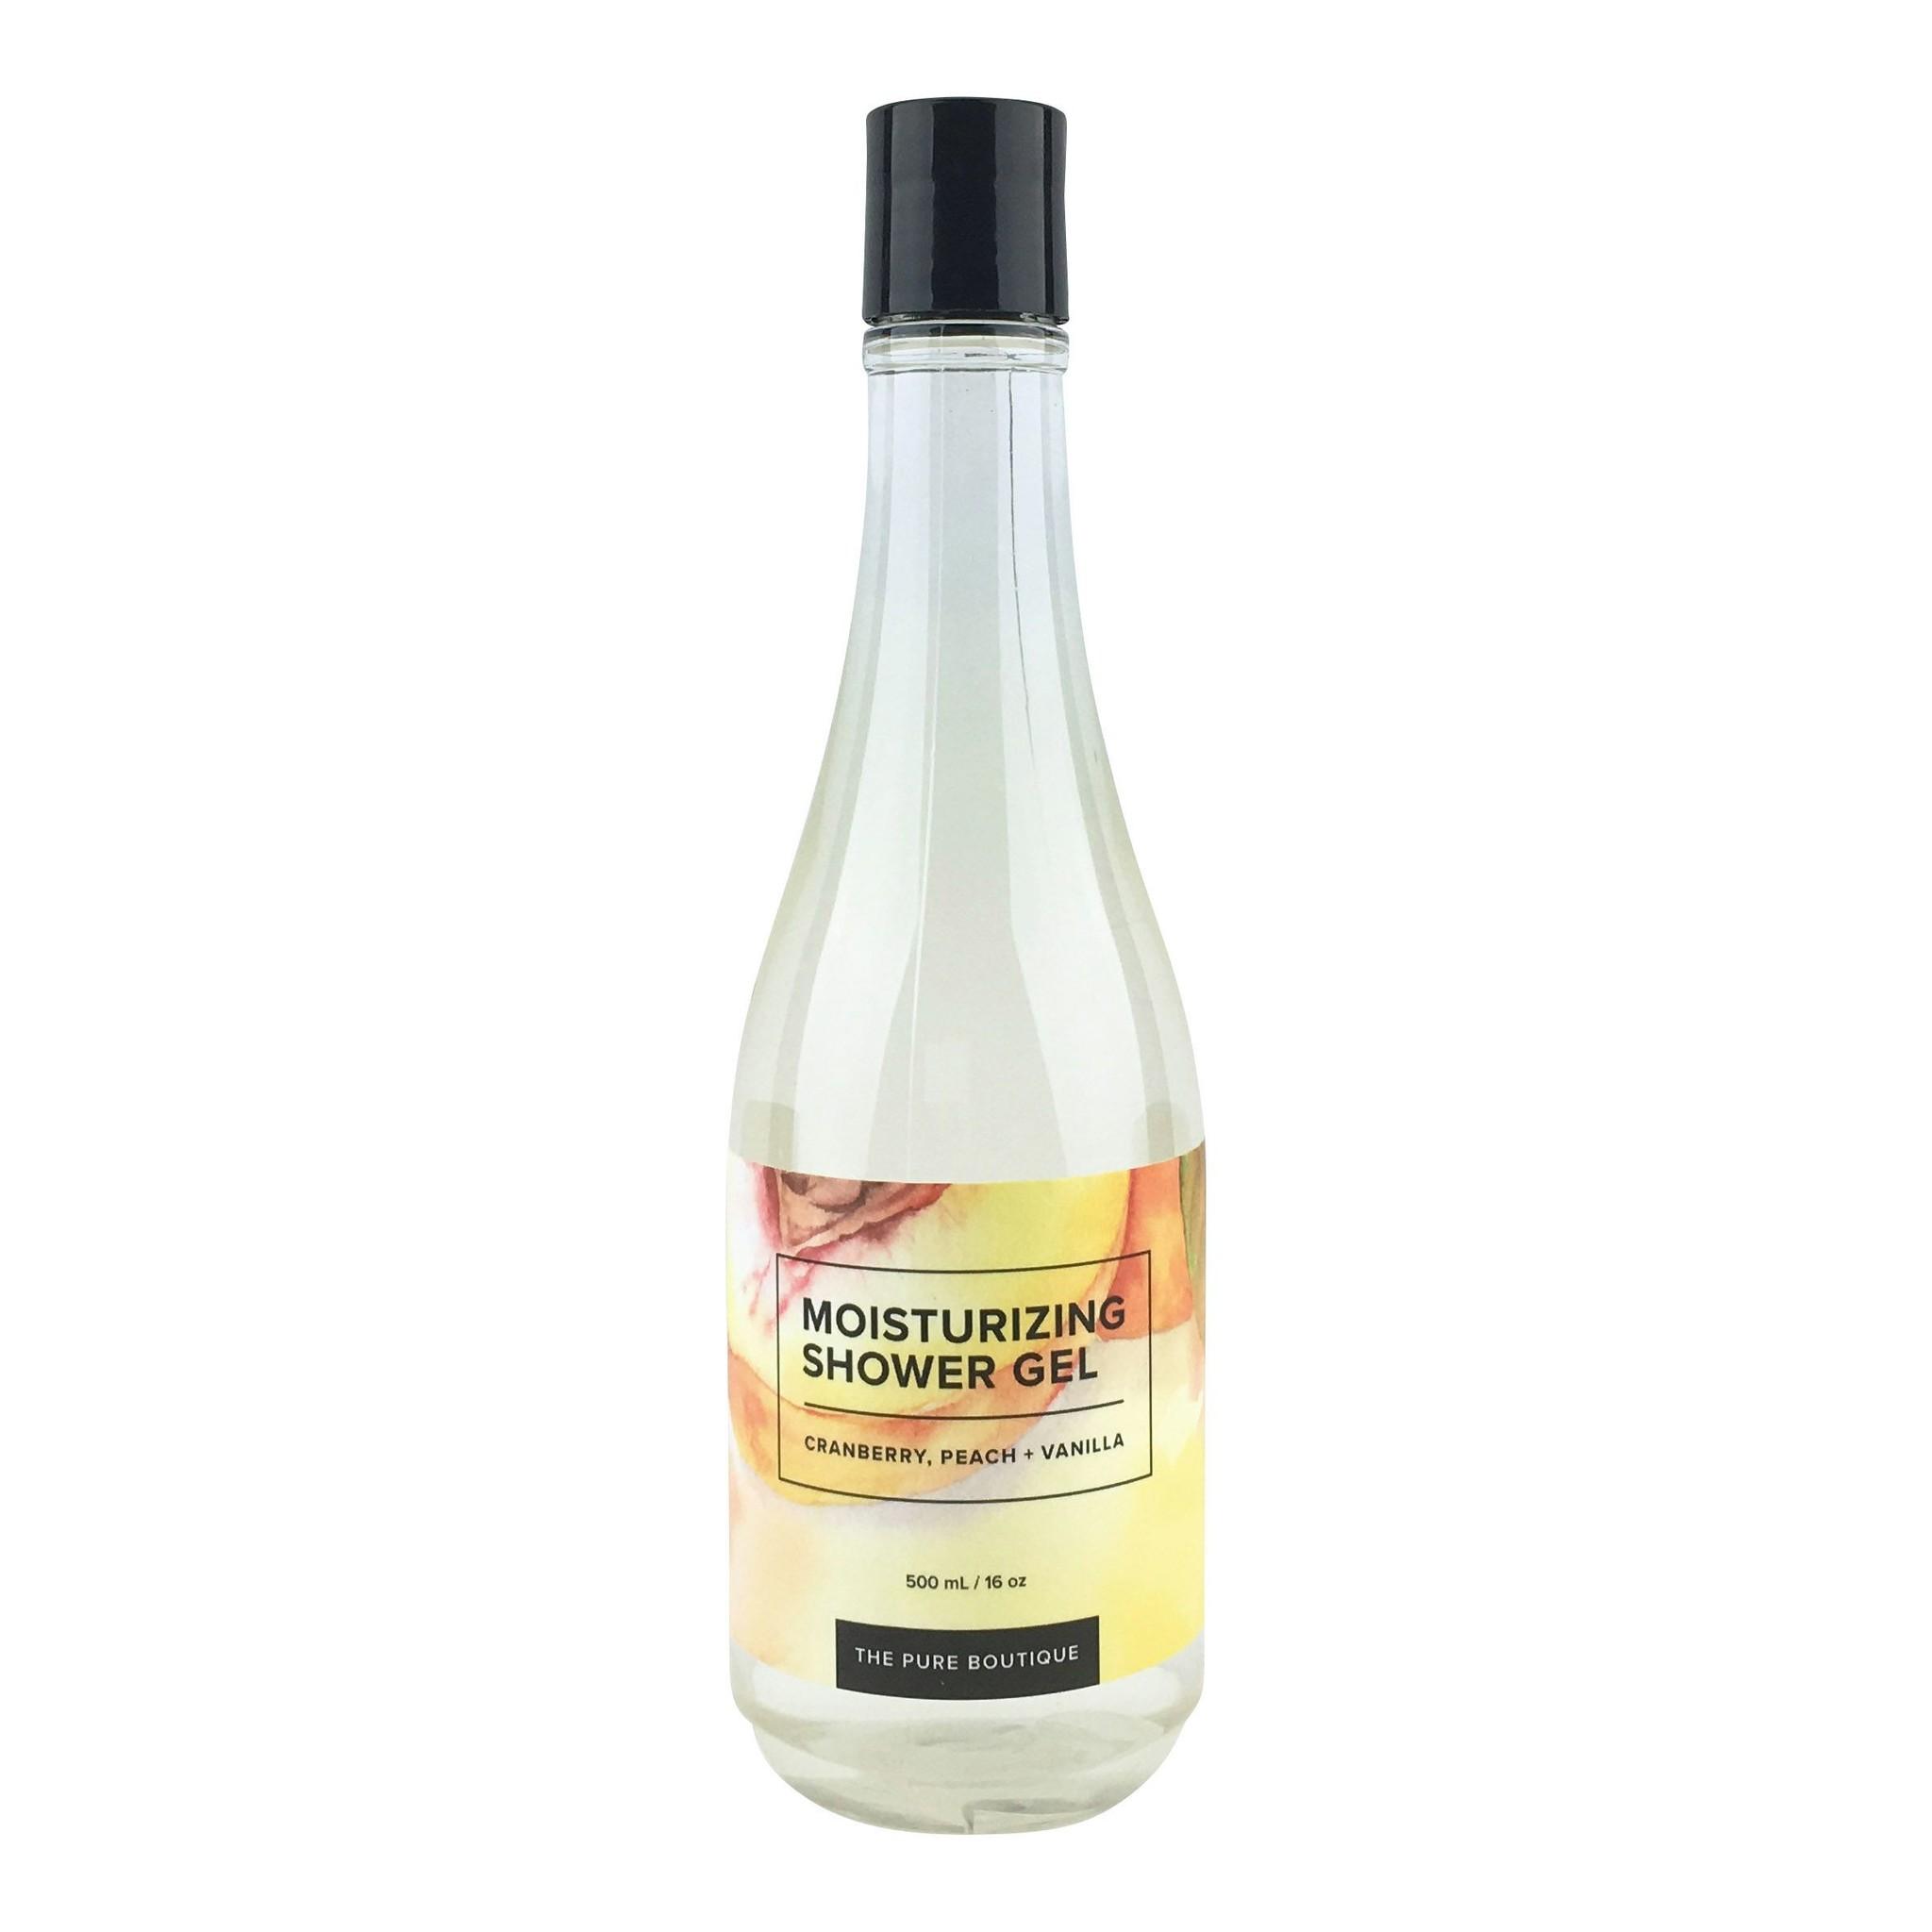 Moisturizing Shower Gel - Cranberry, Peach & Vanilla-1